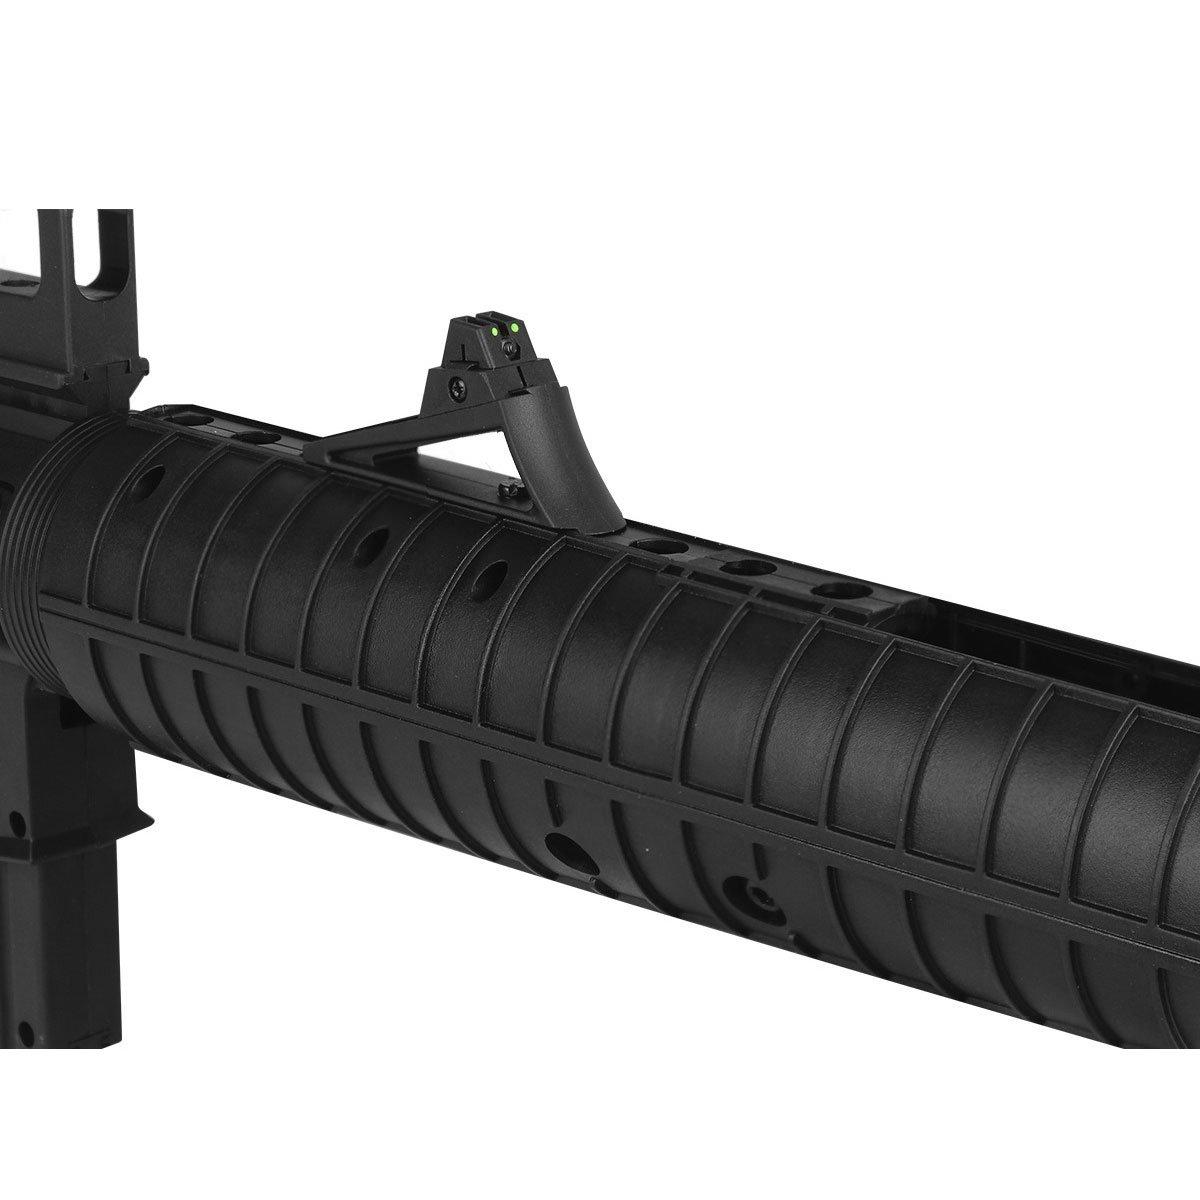 Carabina de Pressao Rossi SAG M16R com Gas Ram 5,5mm